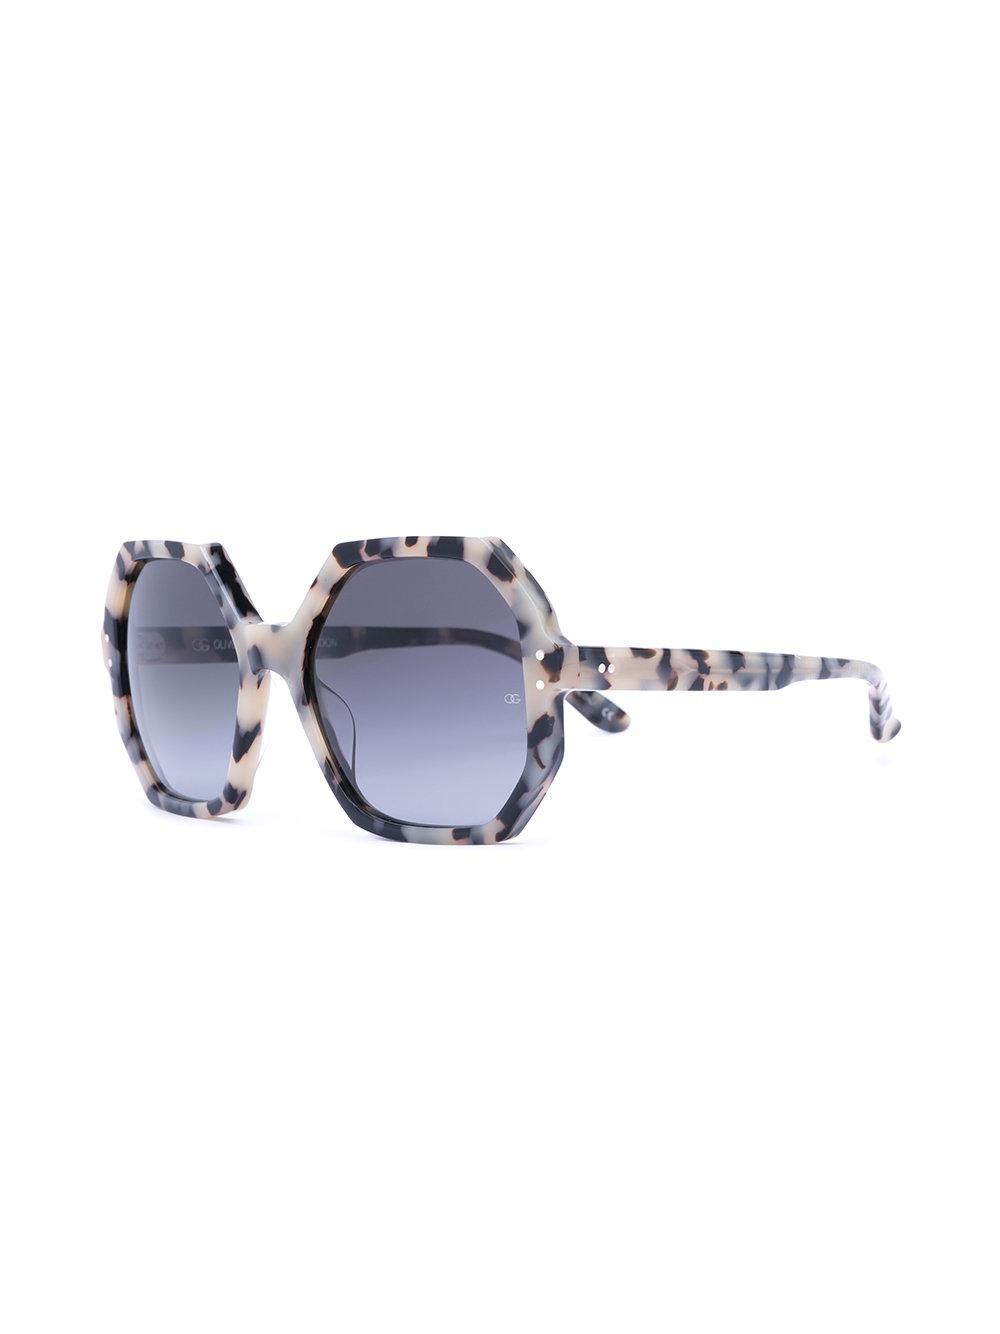 Oliver Goldsmith 'yatton' Geometric Frame Sunglasses in White